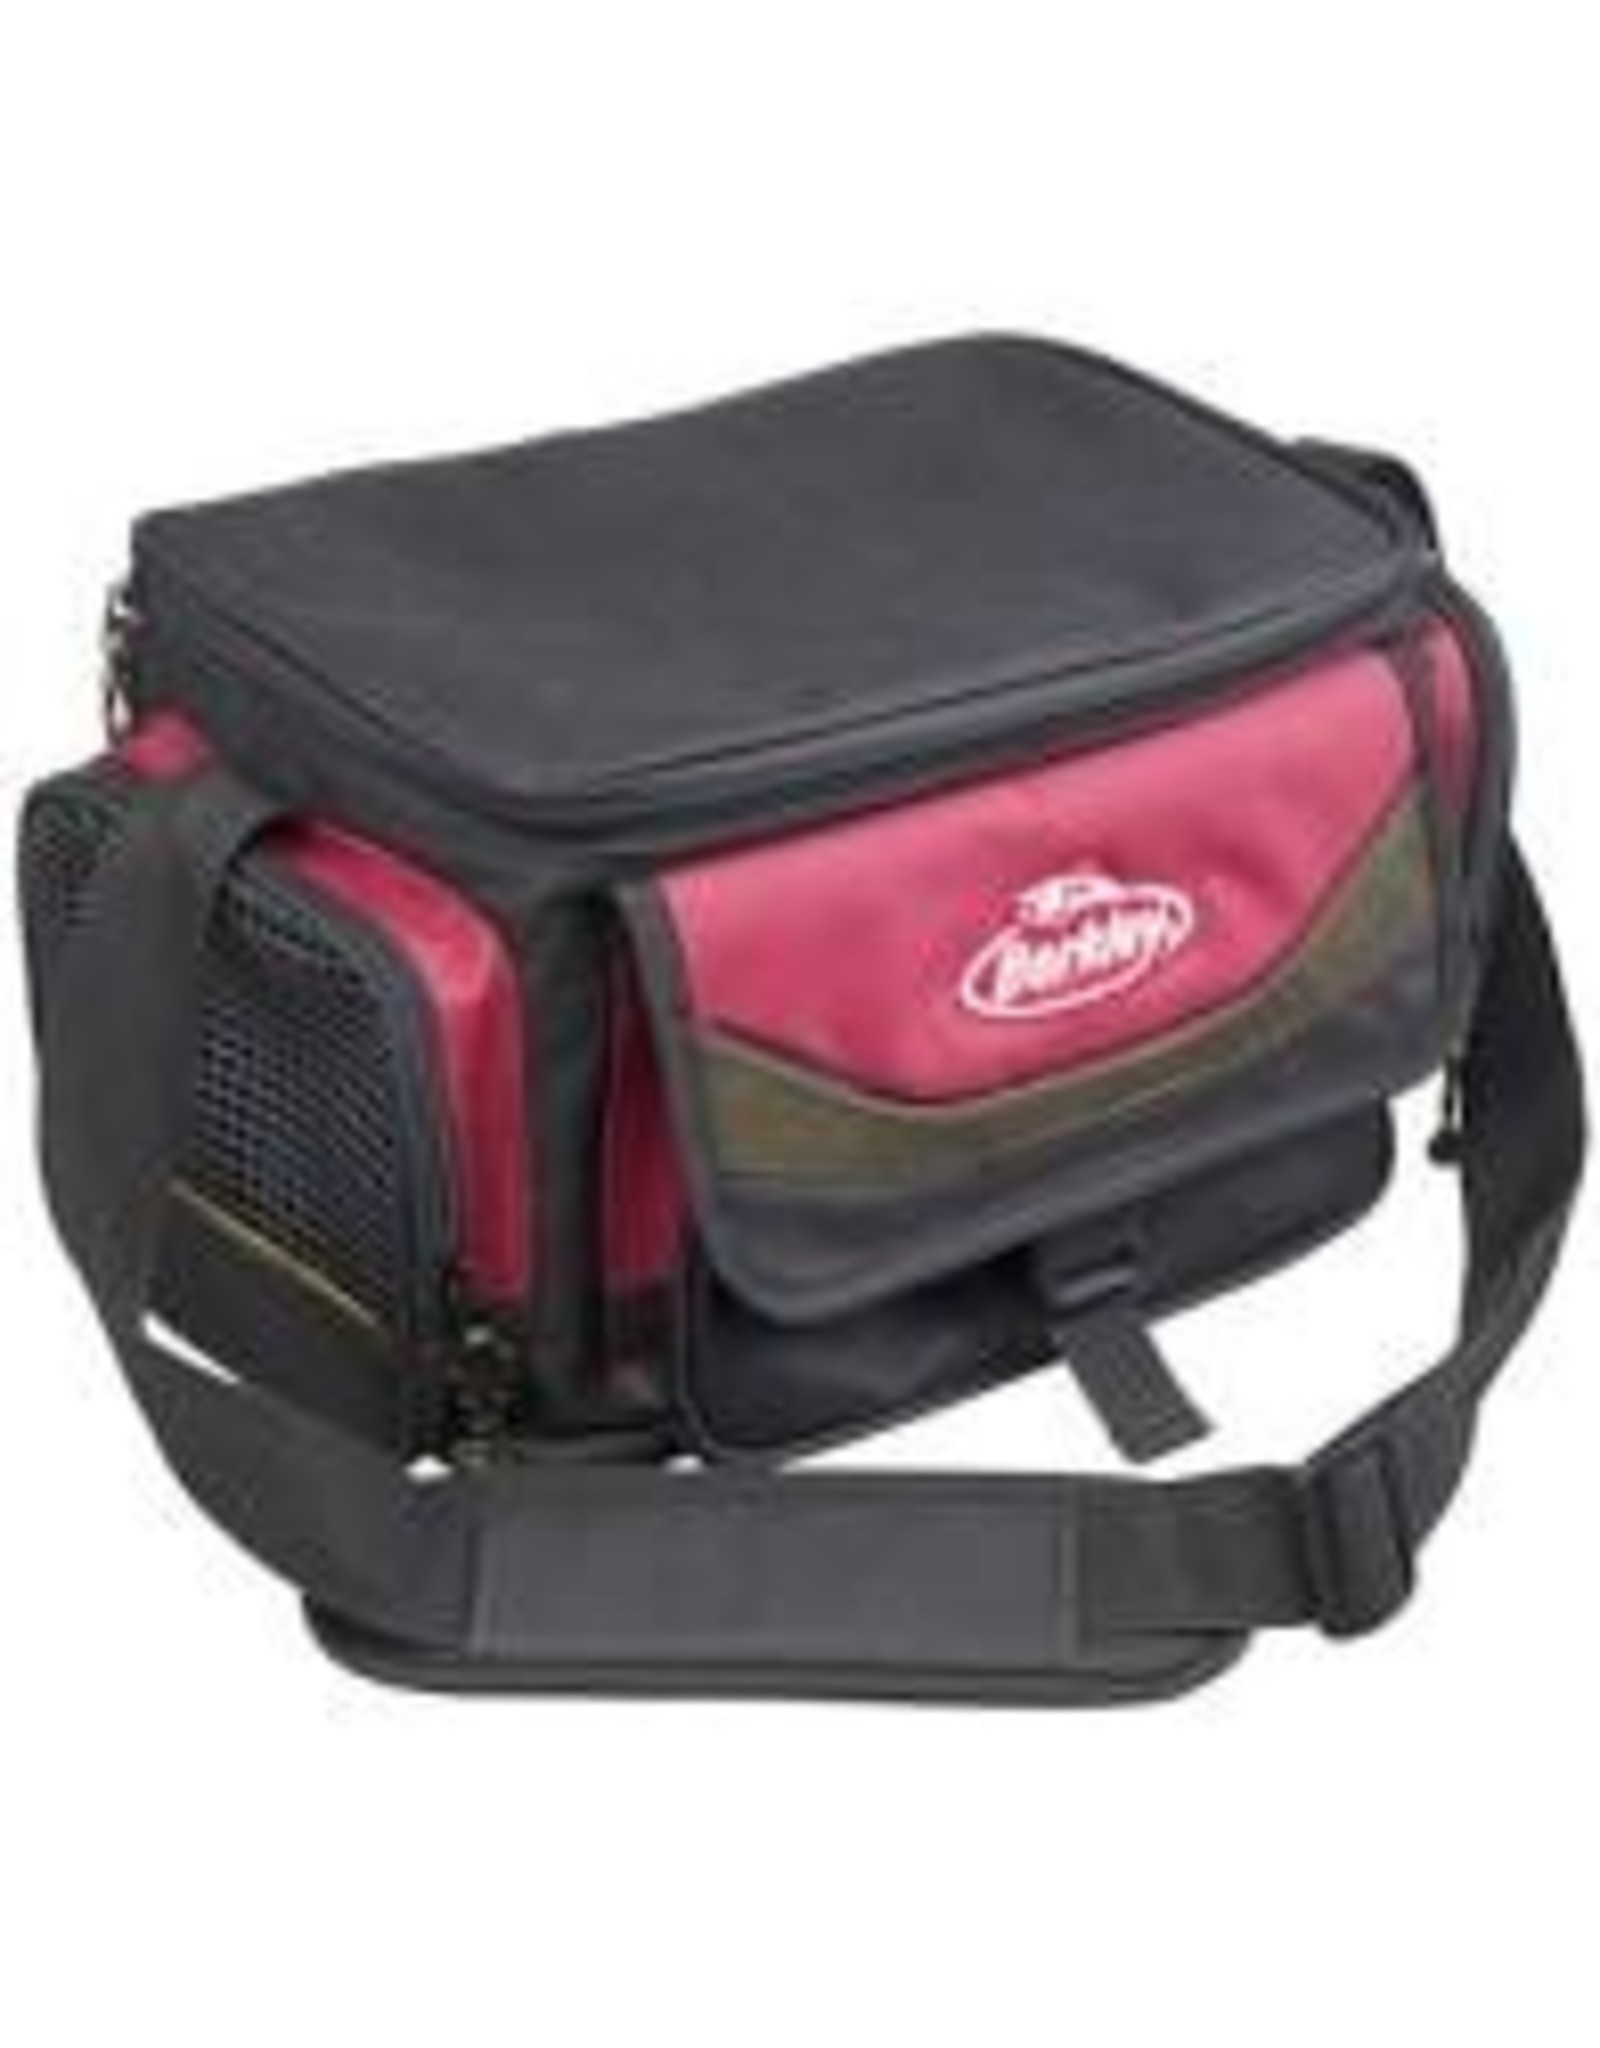 Berkley berkley Bag Red Black